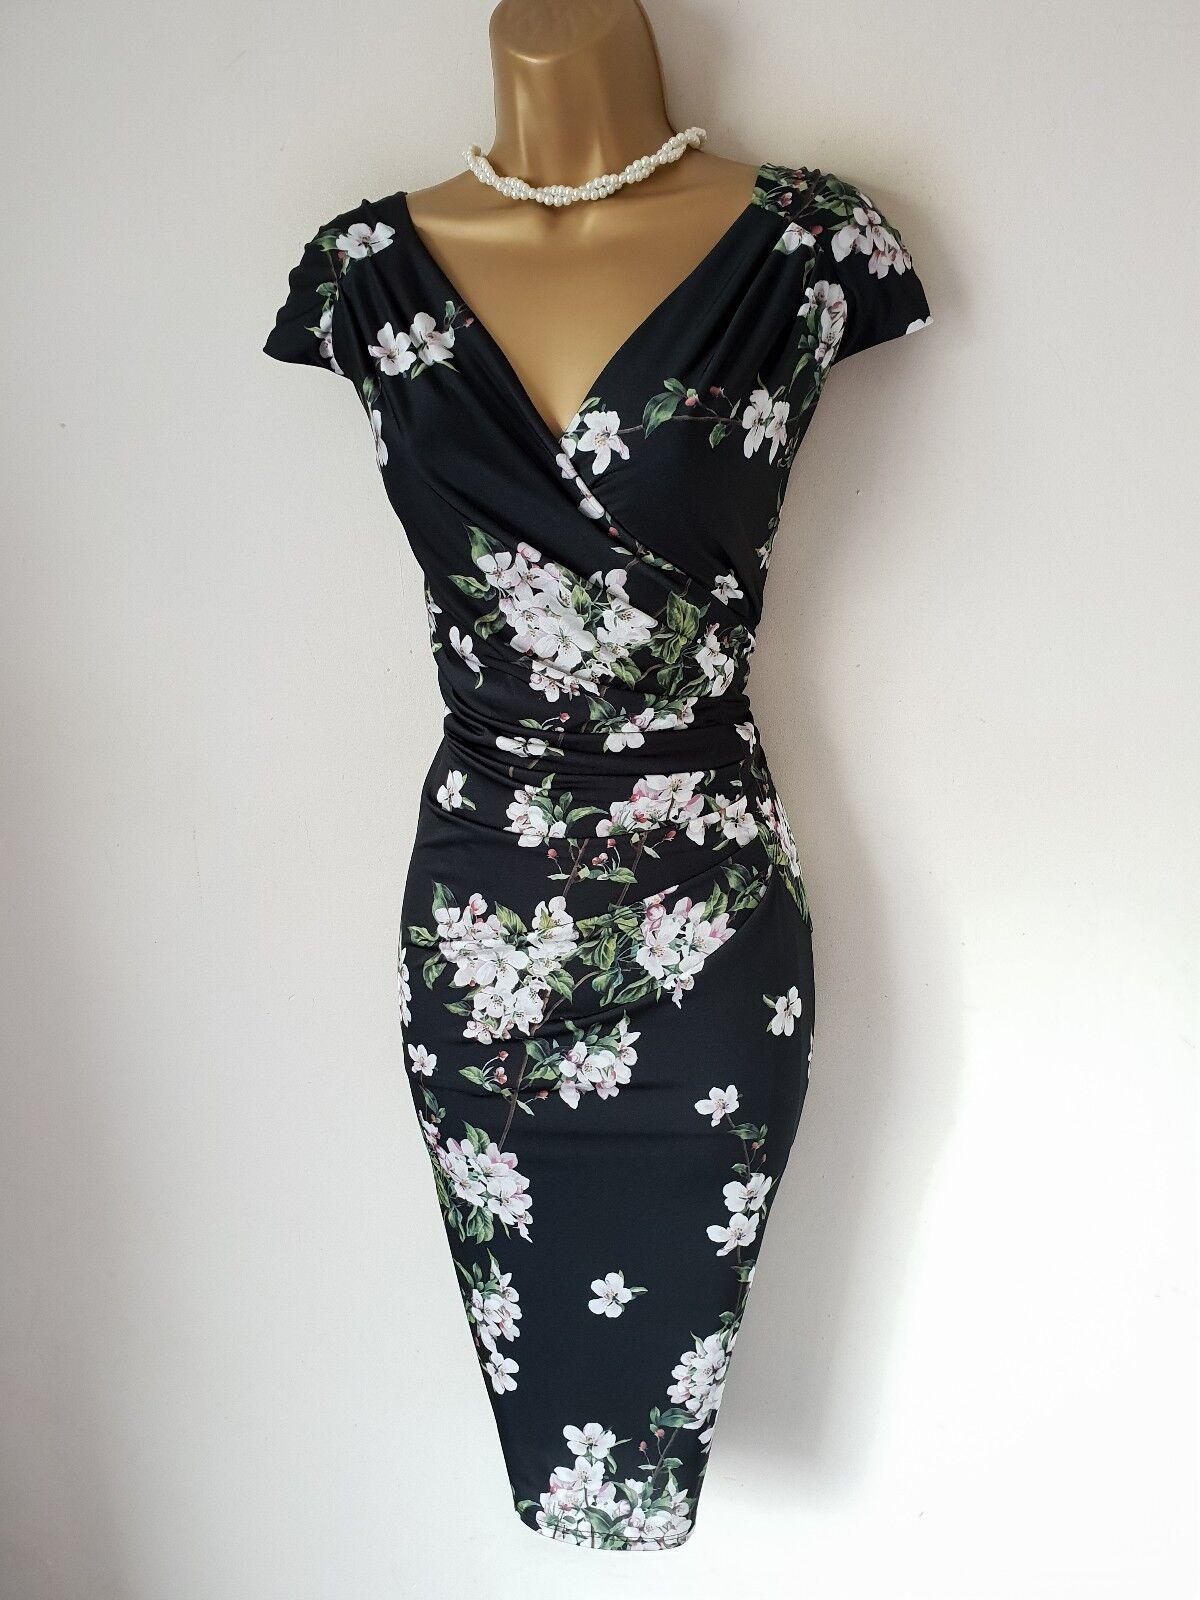 PHASE EIGHT schwarz Floral Blossom Slinky Stretch Wiggle Dress UK 16